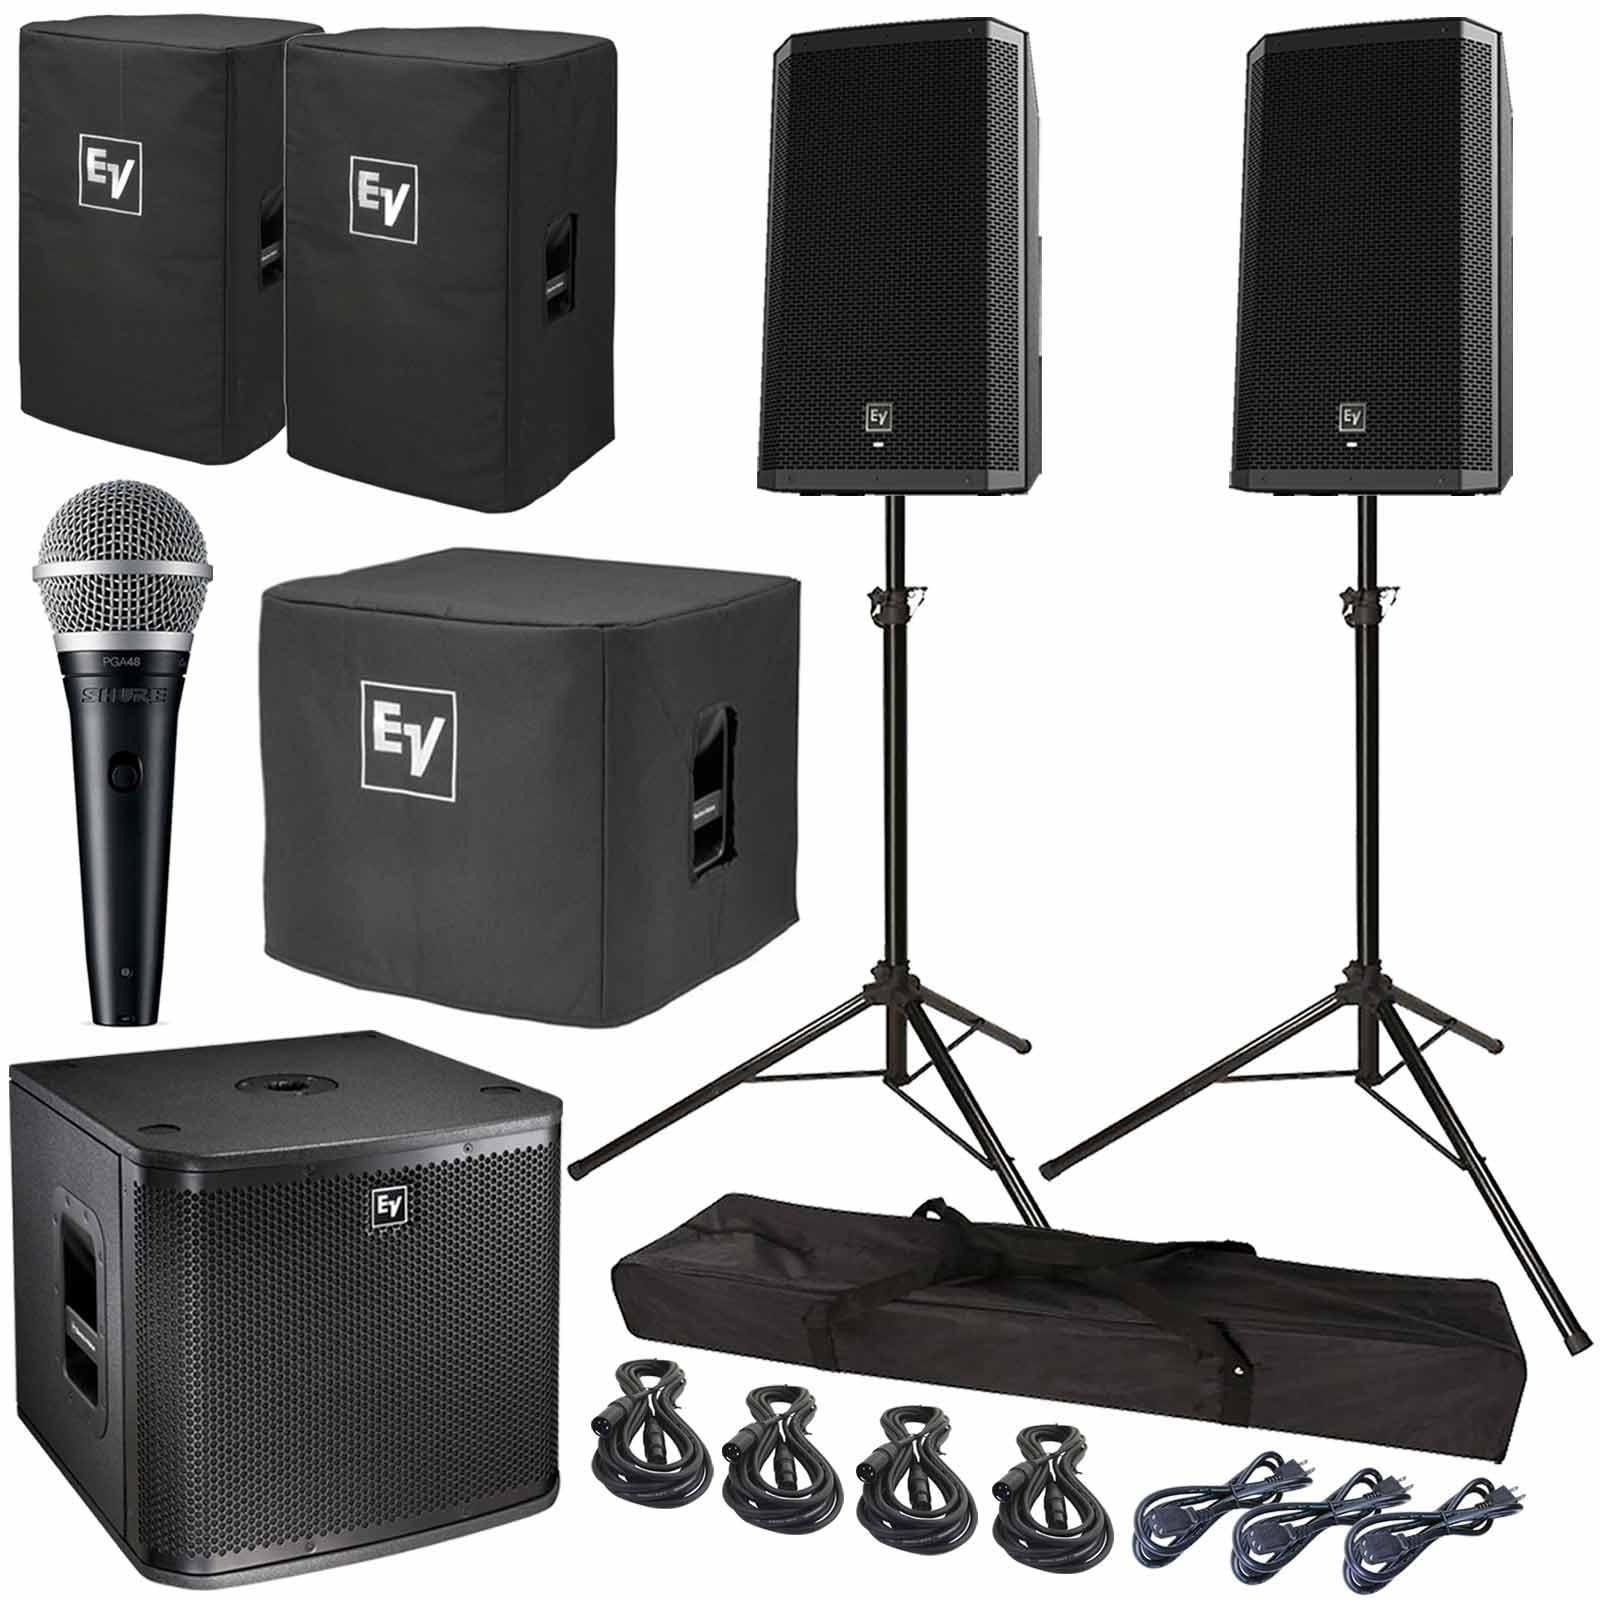 Electro Voice Zlx 12p 12 Powered Speaker Subwoofer Package Speech Amplifier Box